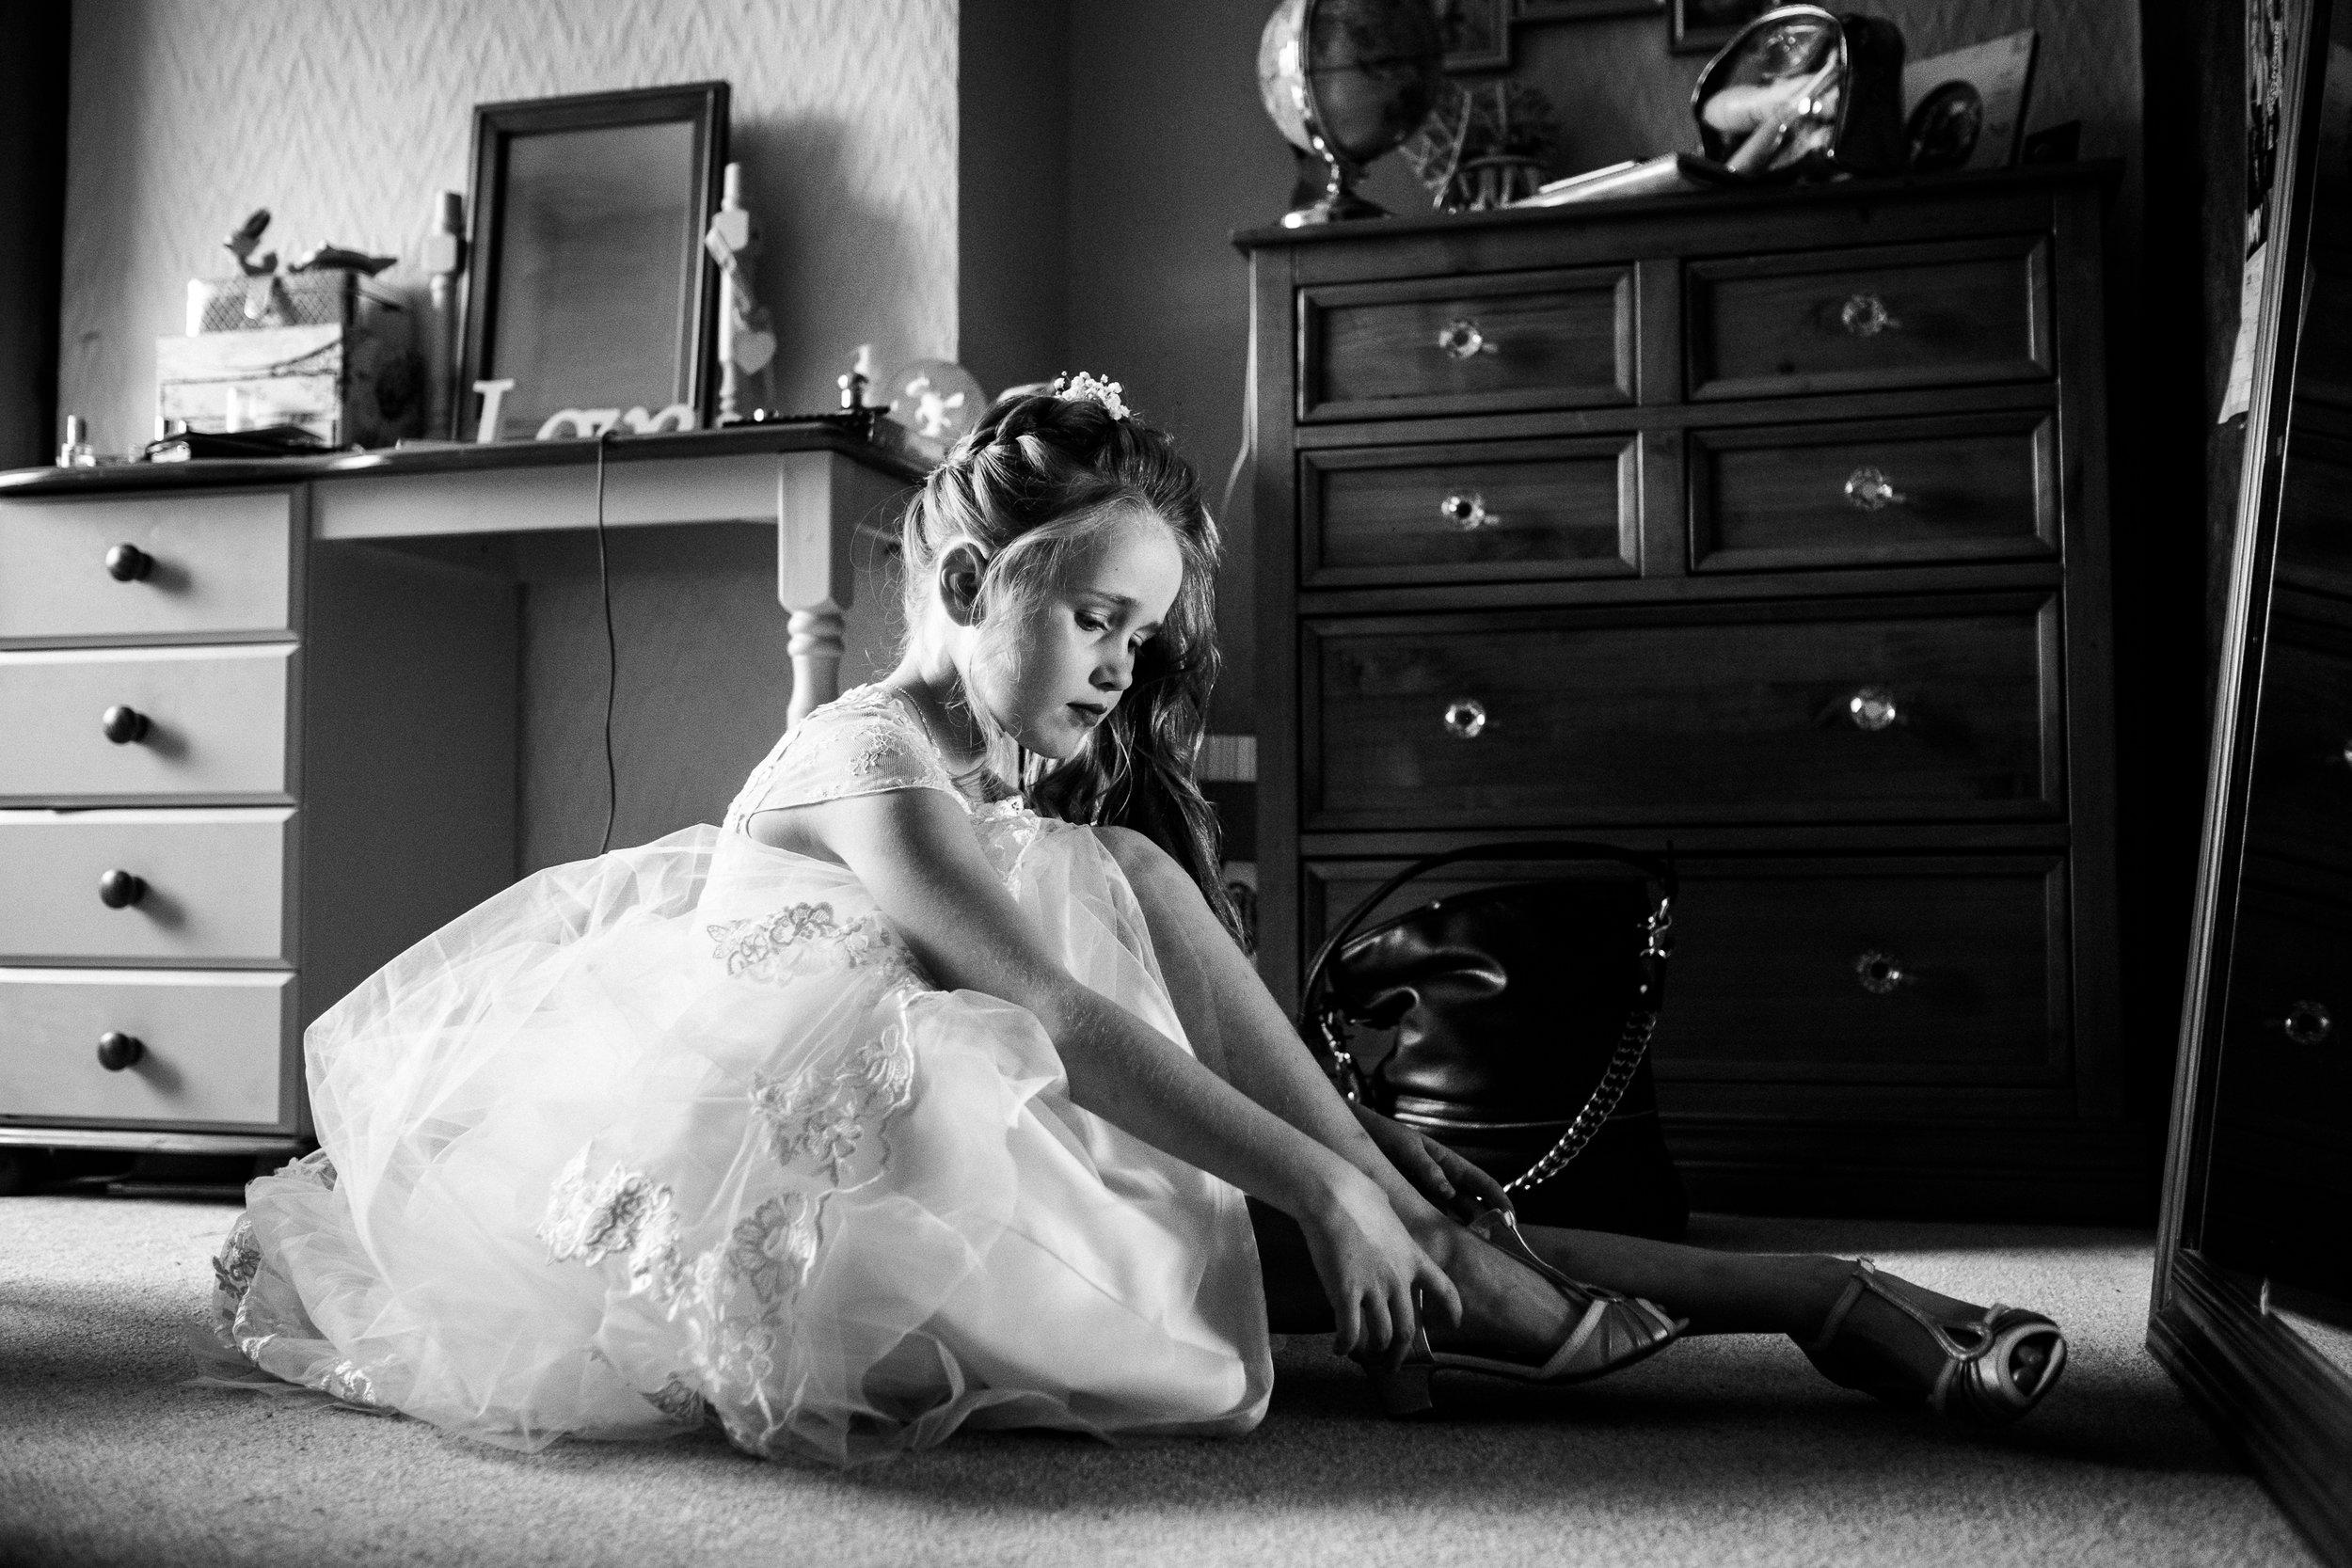 Summer Documentary Wedding Photography Floral Hall, Stoke-on-Trent, Staffordshire - Jenny Harper-15.jpg